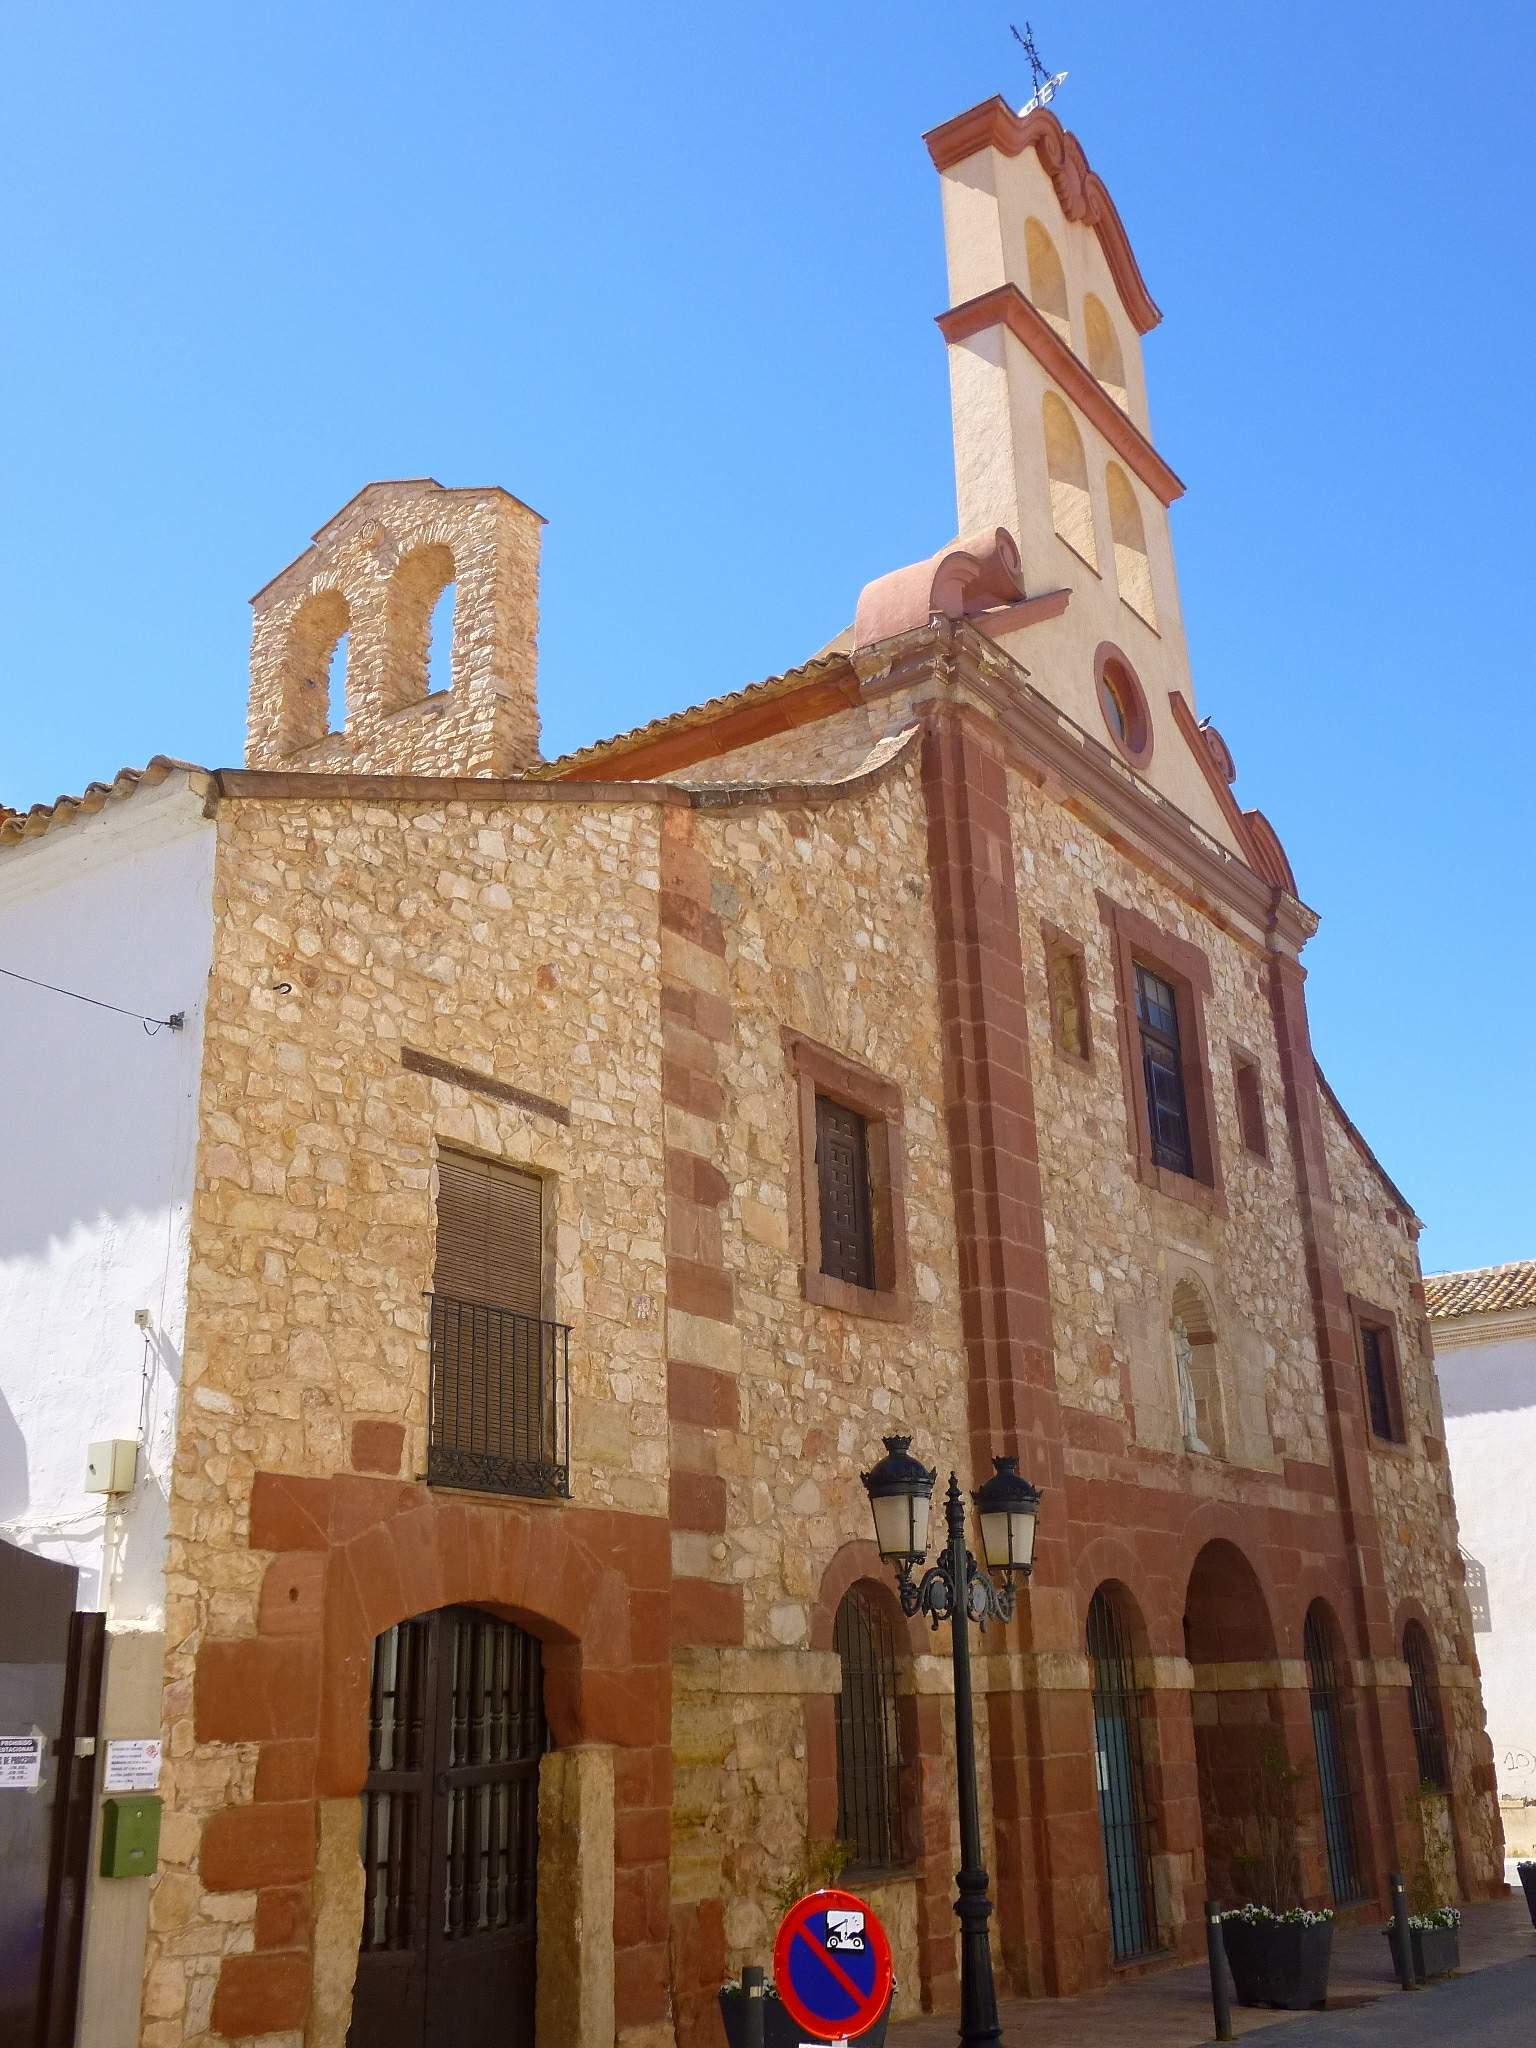 File:Campo de Criptana - Iglesia del Convento de los ...